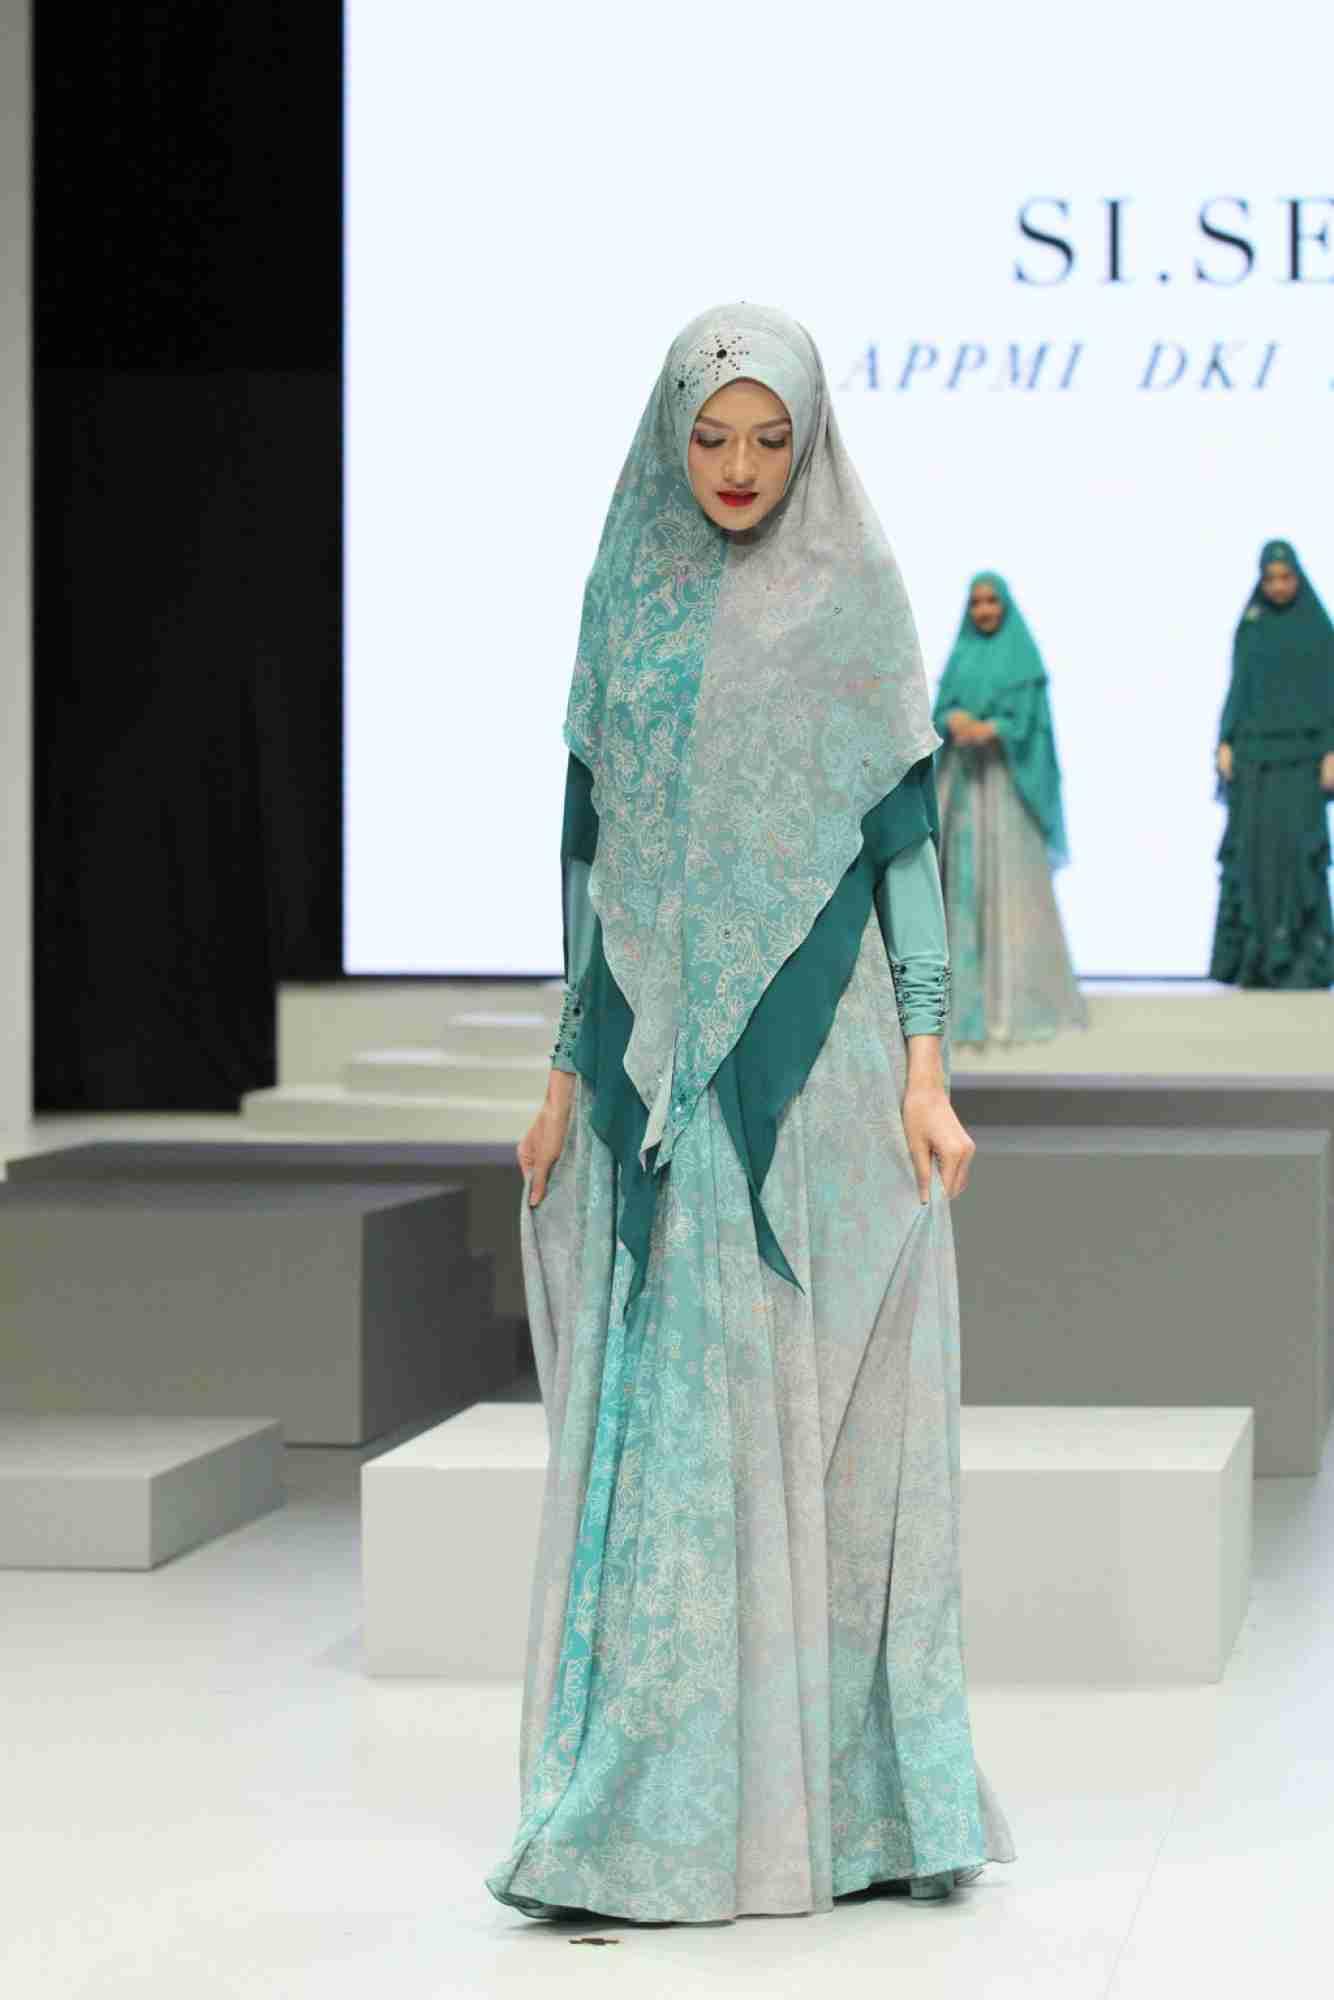 Model baju batik gamis syar'i fresh